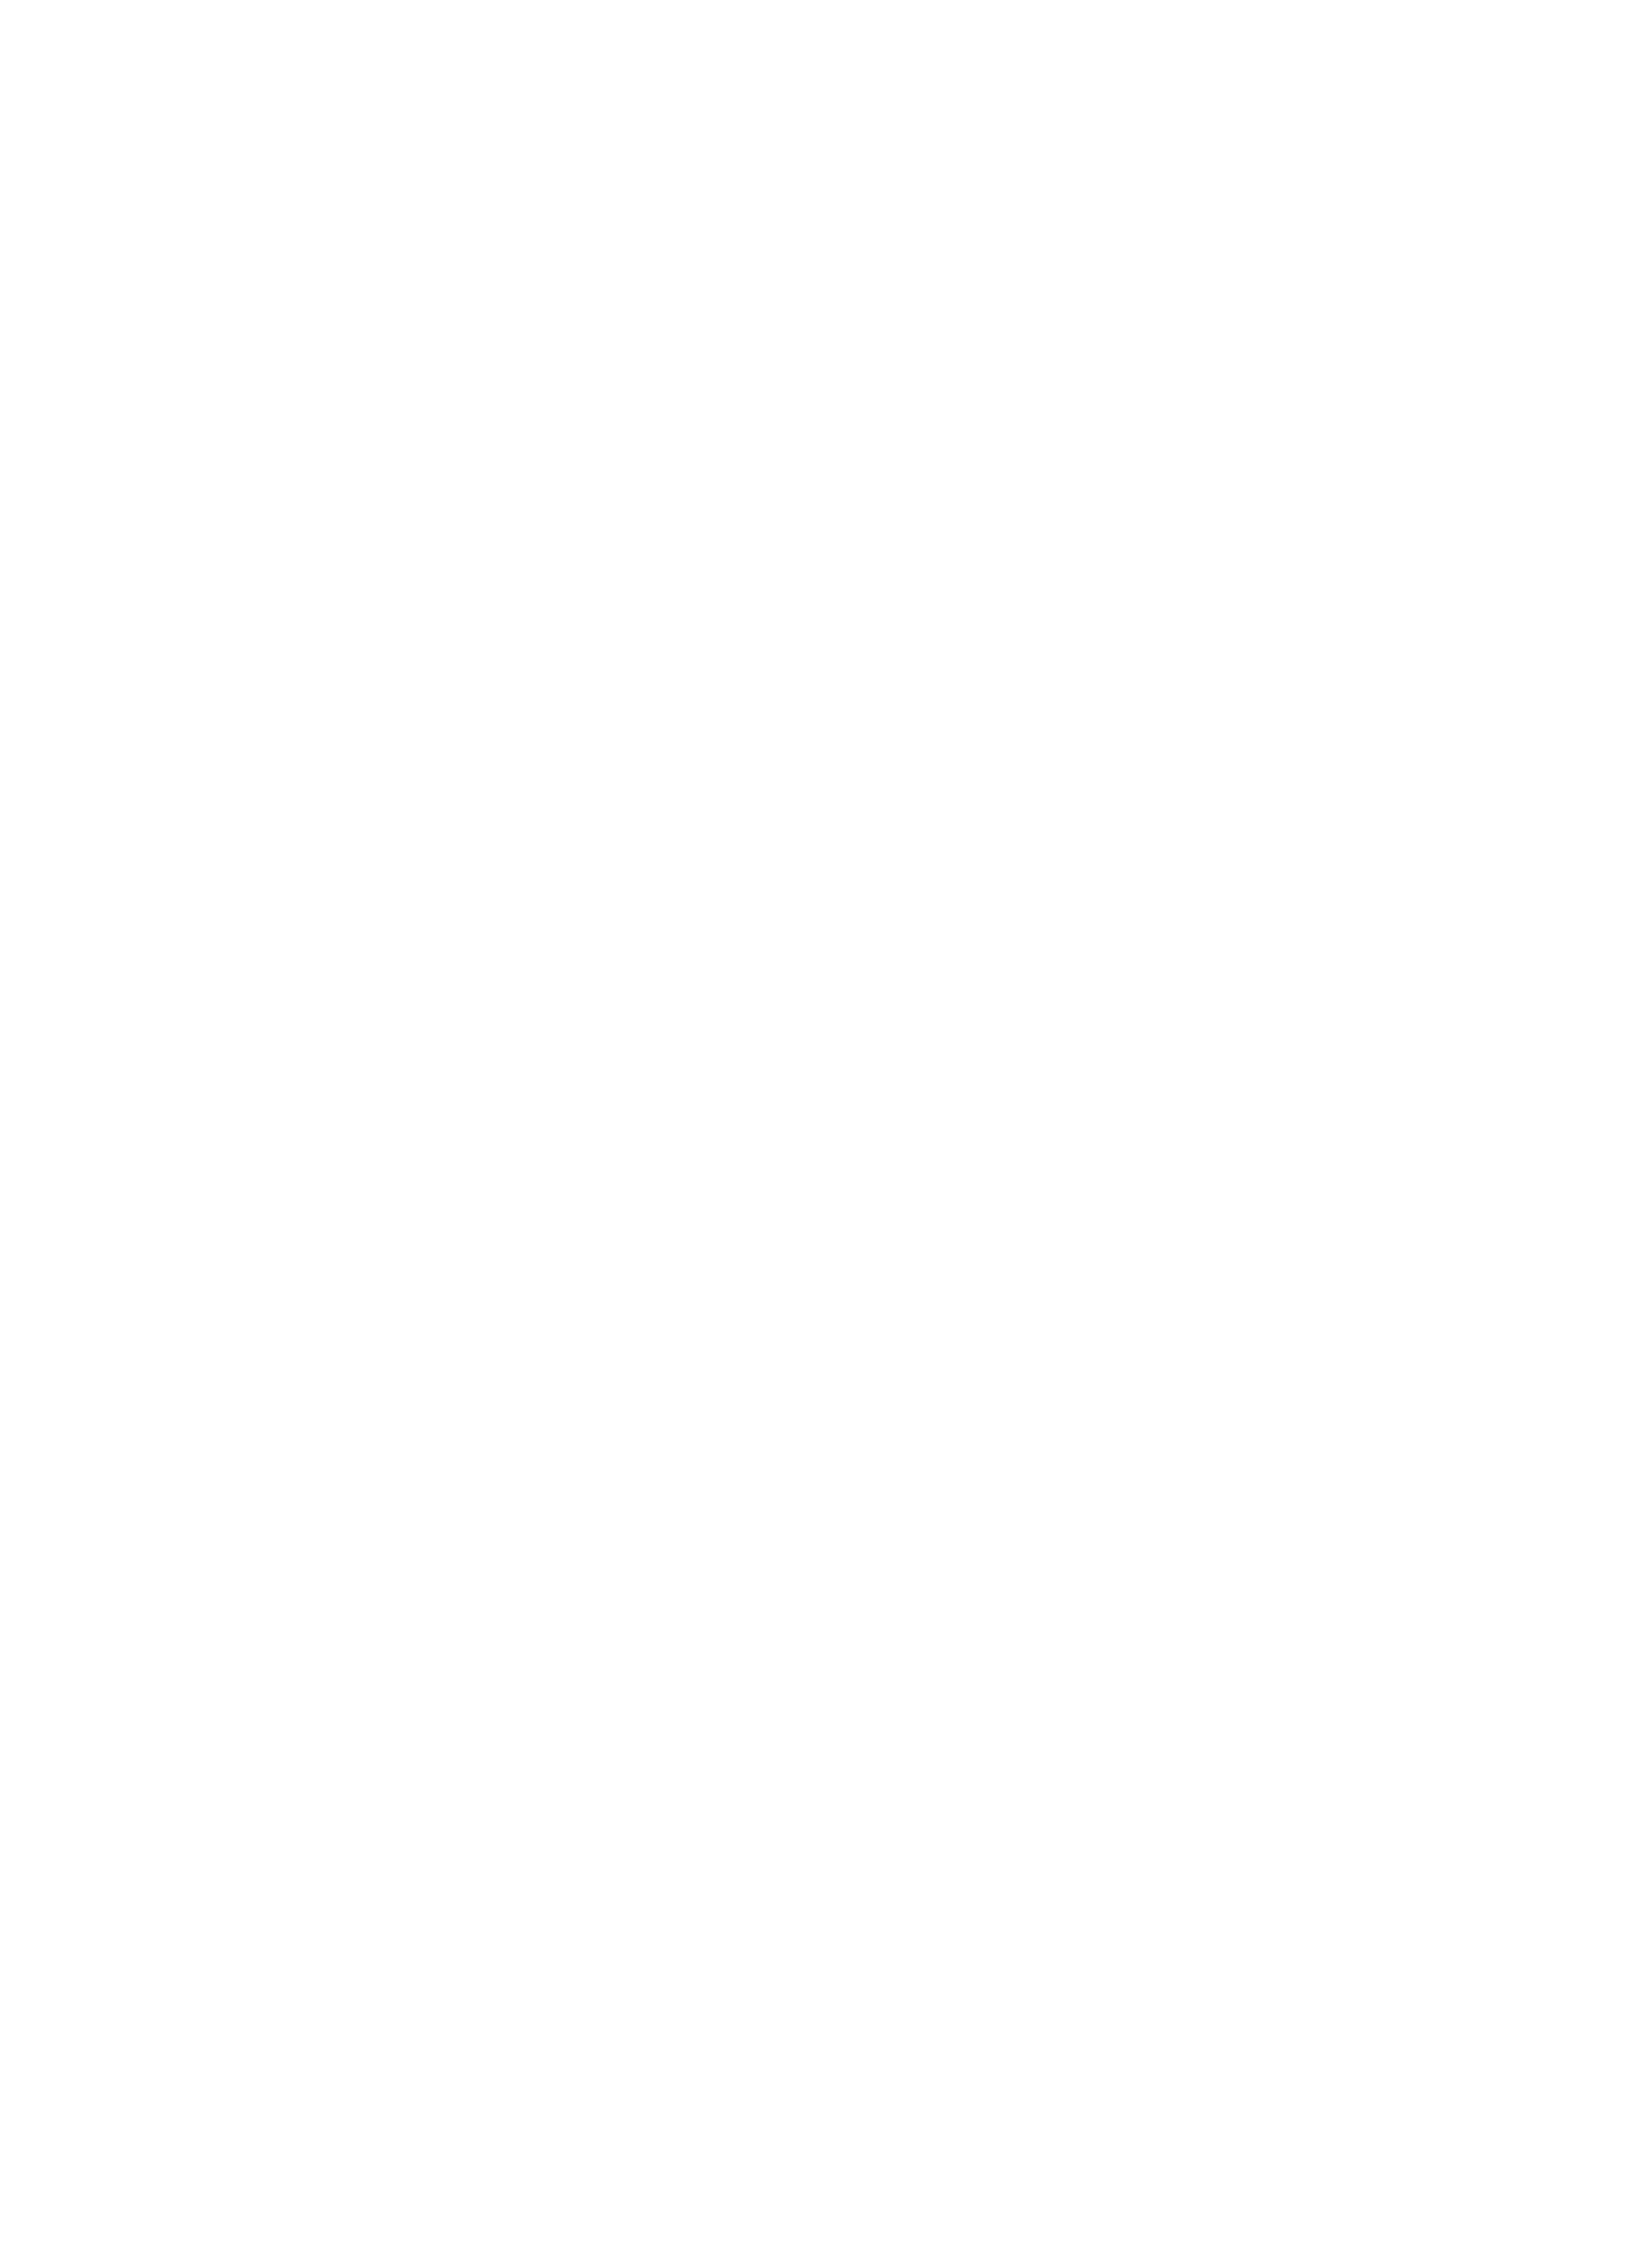 Bridal Veil Clipart.